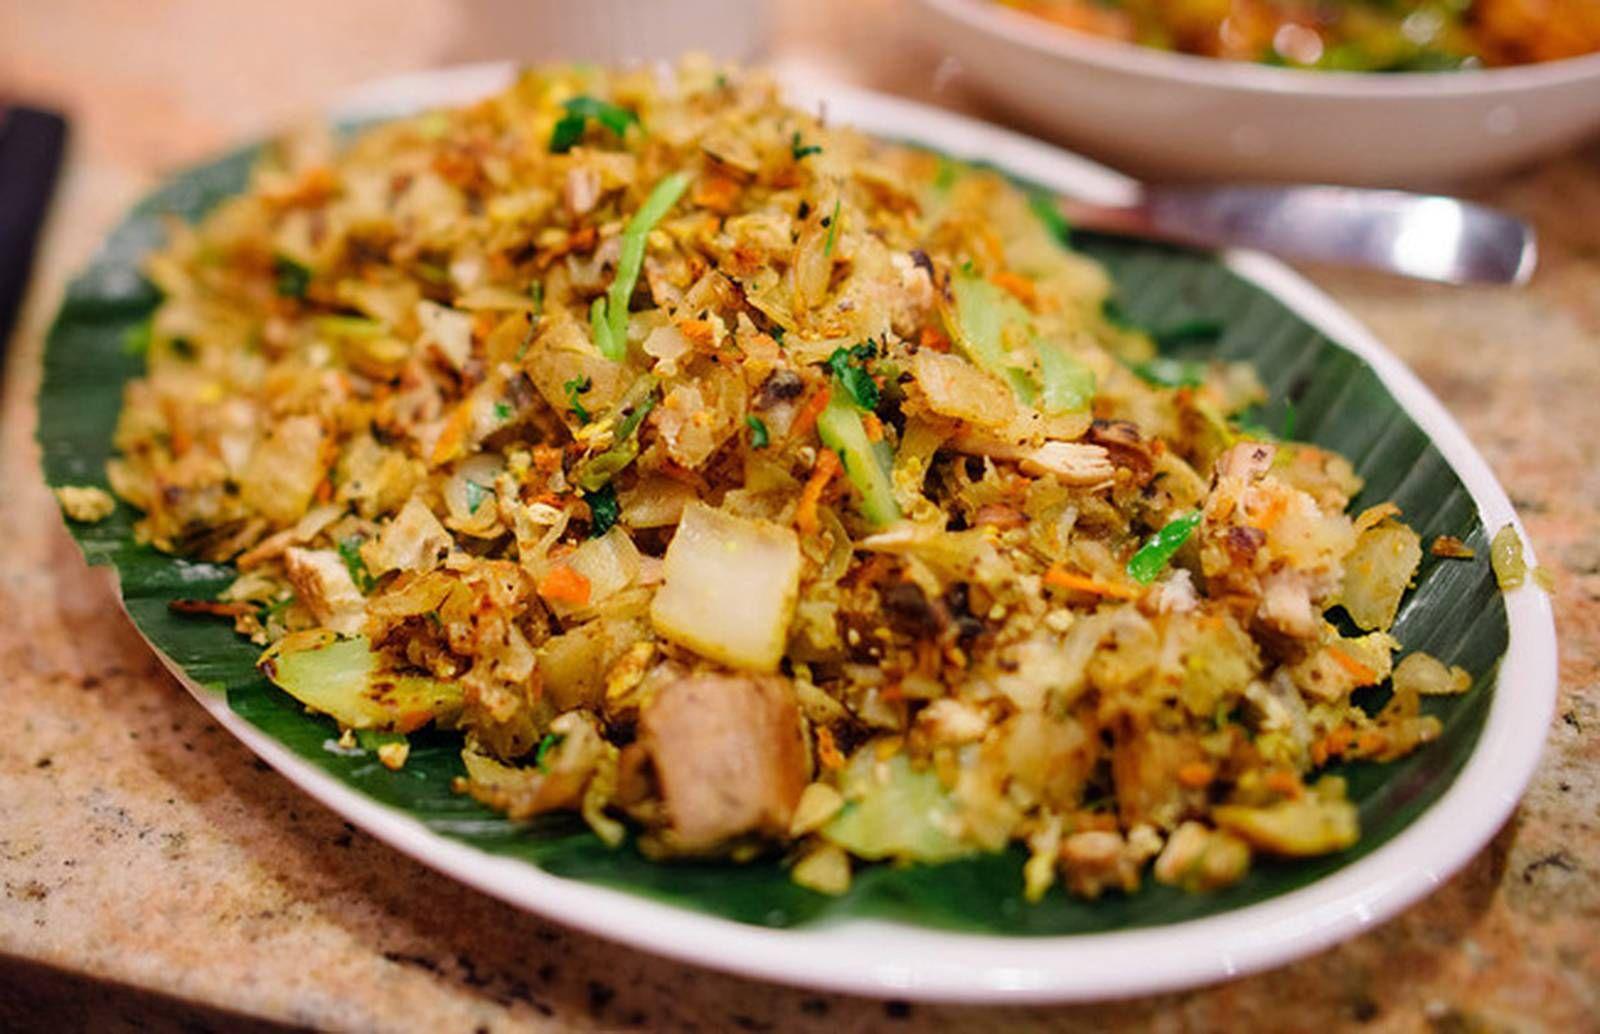 Best Street Food in Sri Lanka To Have An Amazing Gastronomic Experience-Kottu Roti